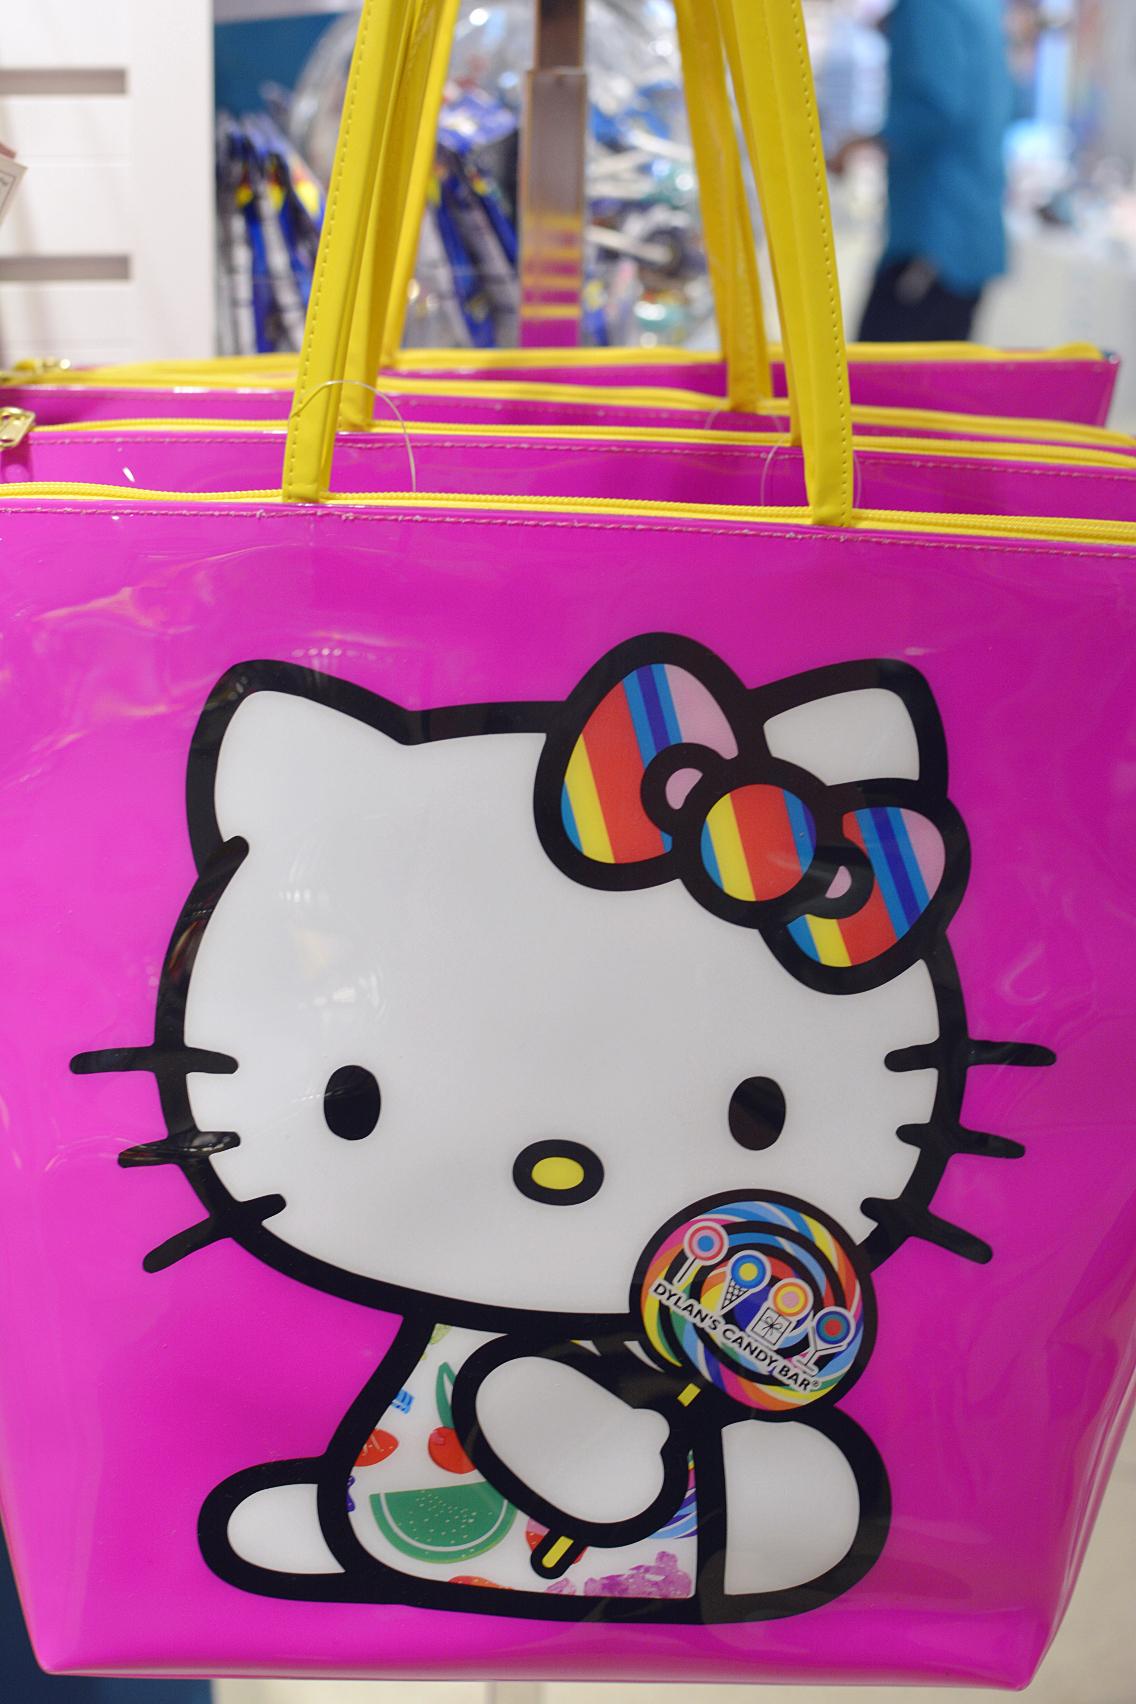 Dylan's Candy Bar Hello Kitty